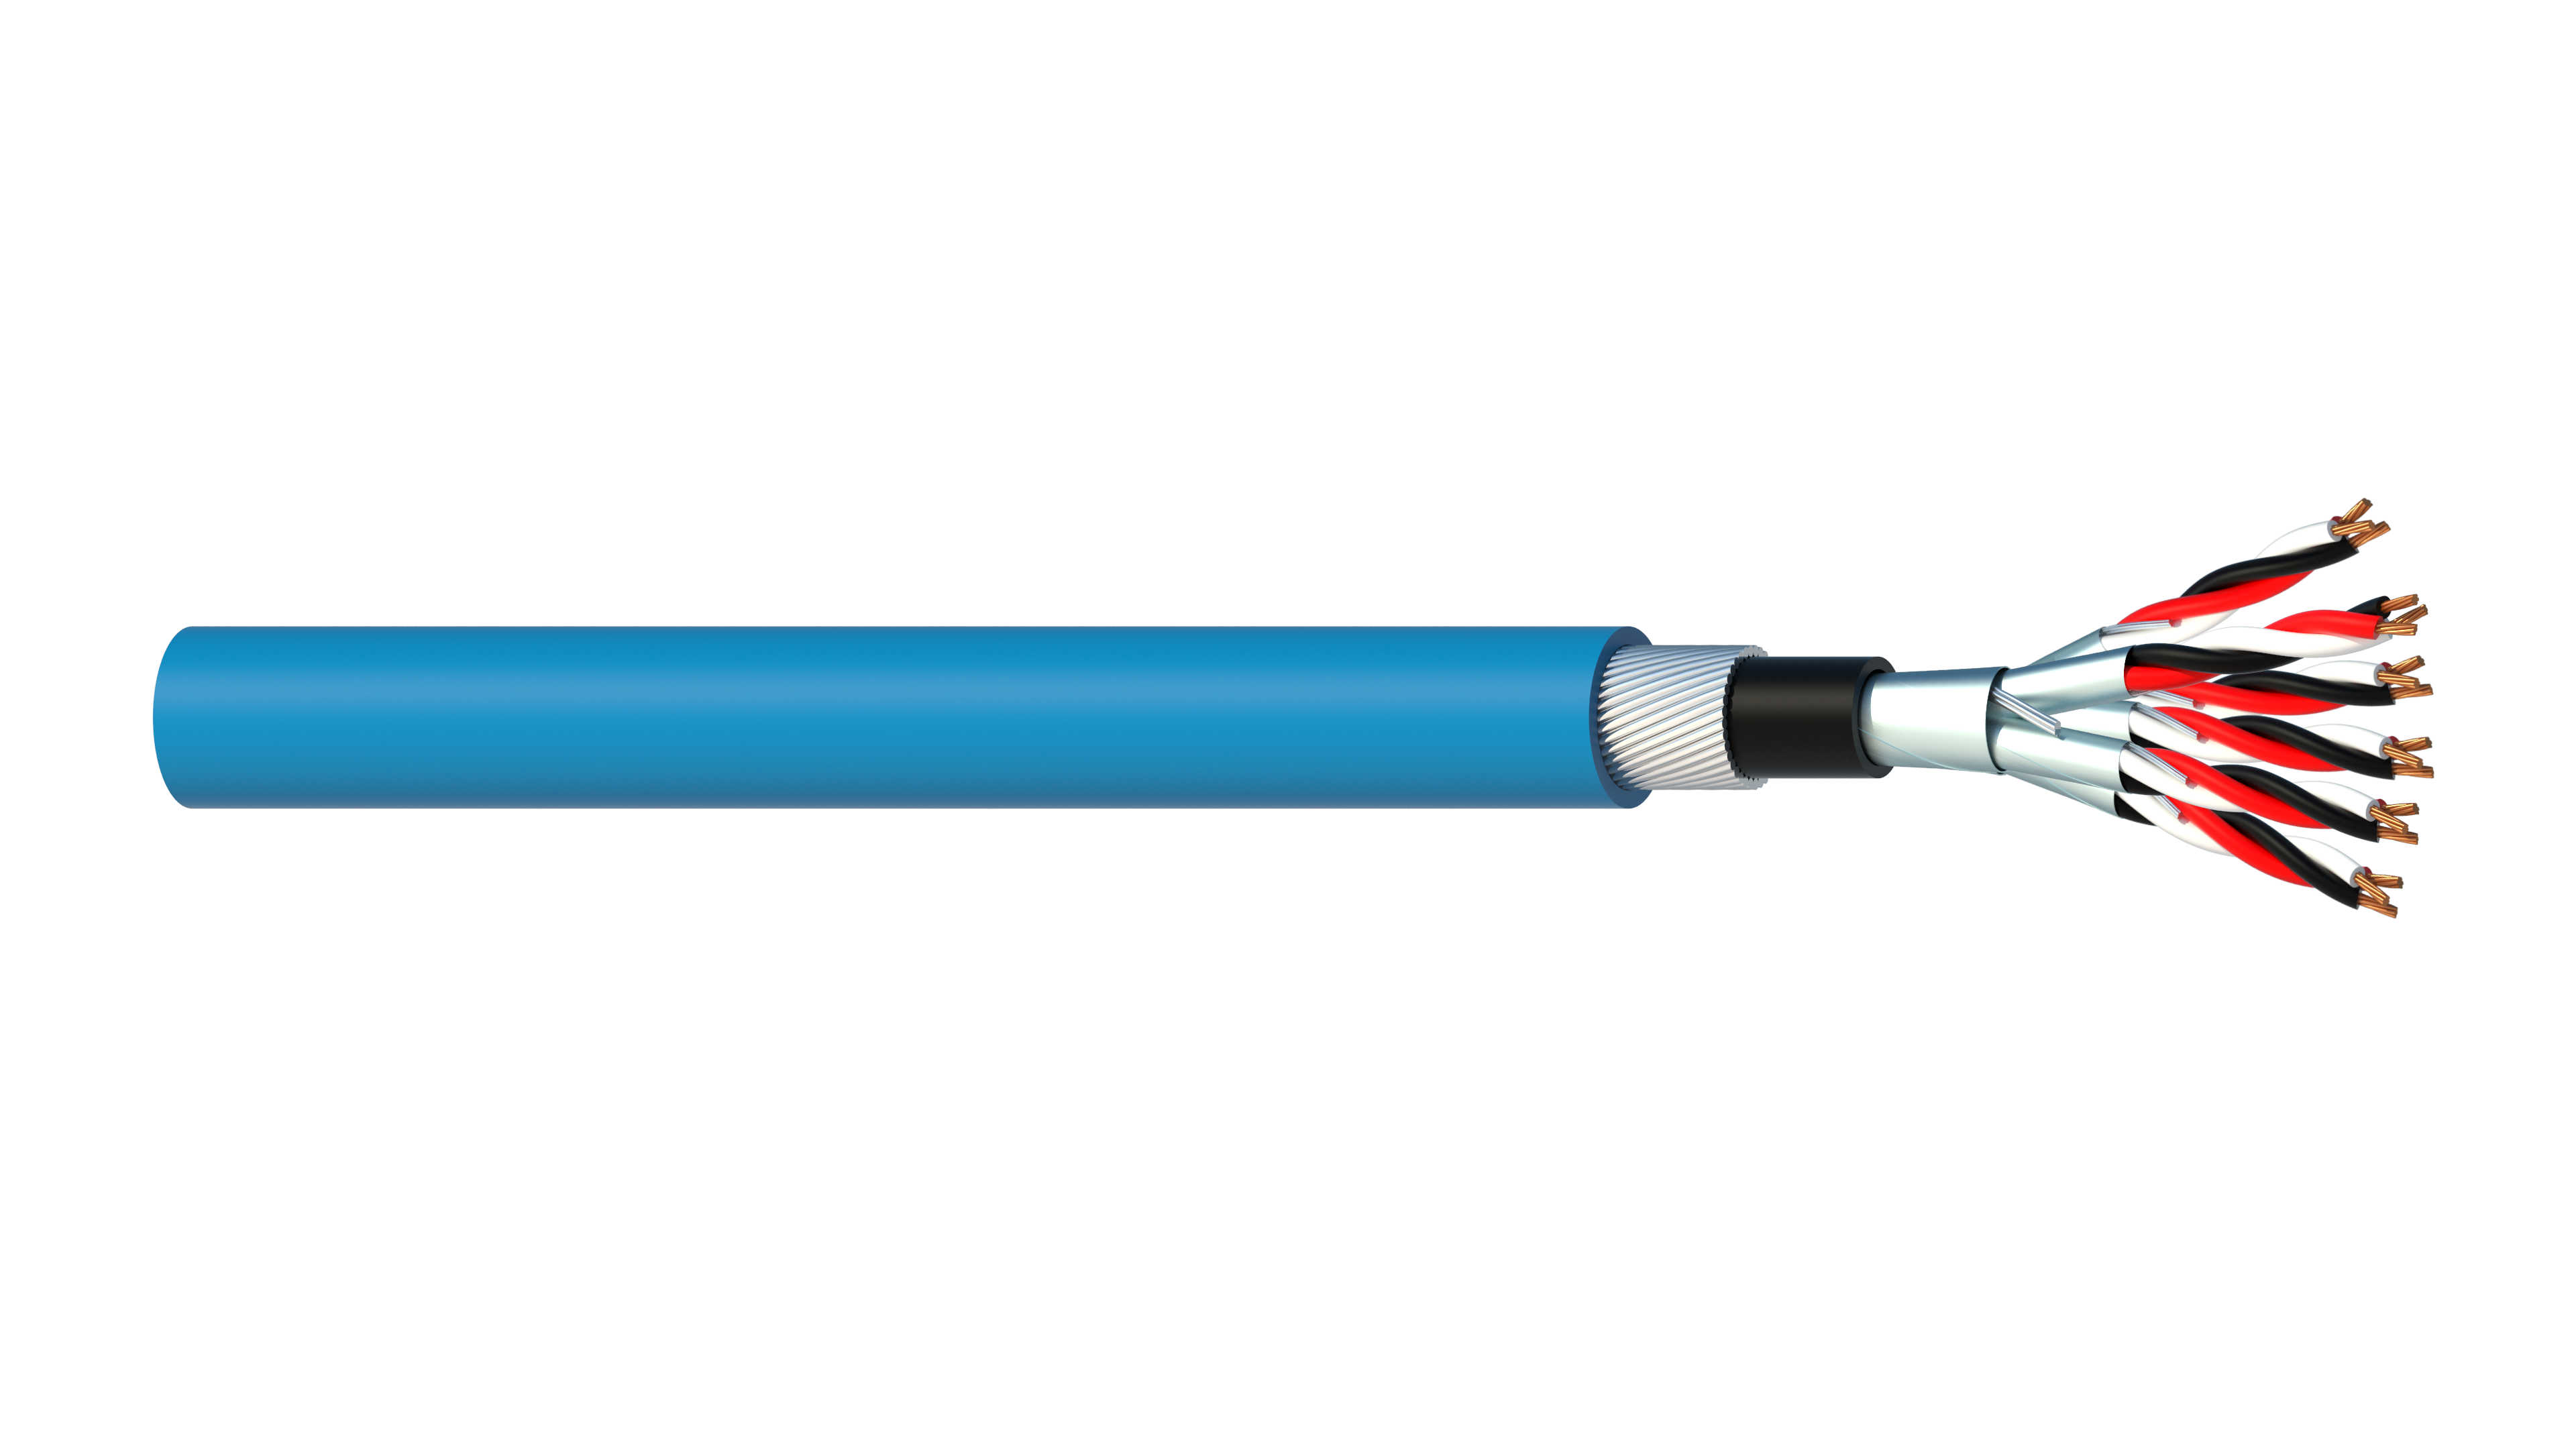 6 Triad 0.5mm2 Cu/PVC/ISOS/PVC/SWA/PVC Maser Instrumentation Cable - Blue Sheath